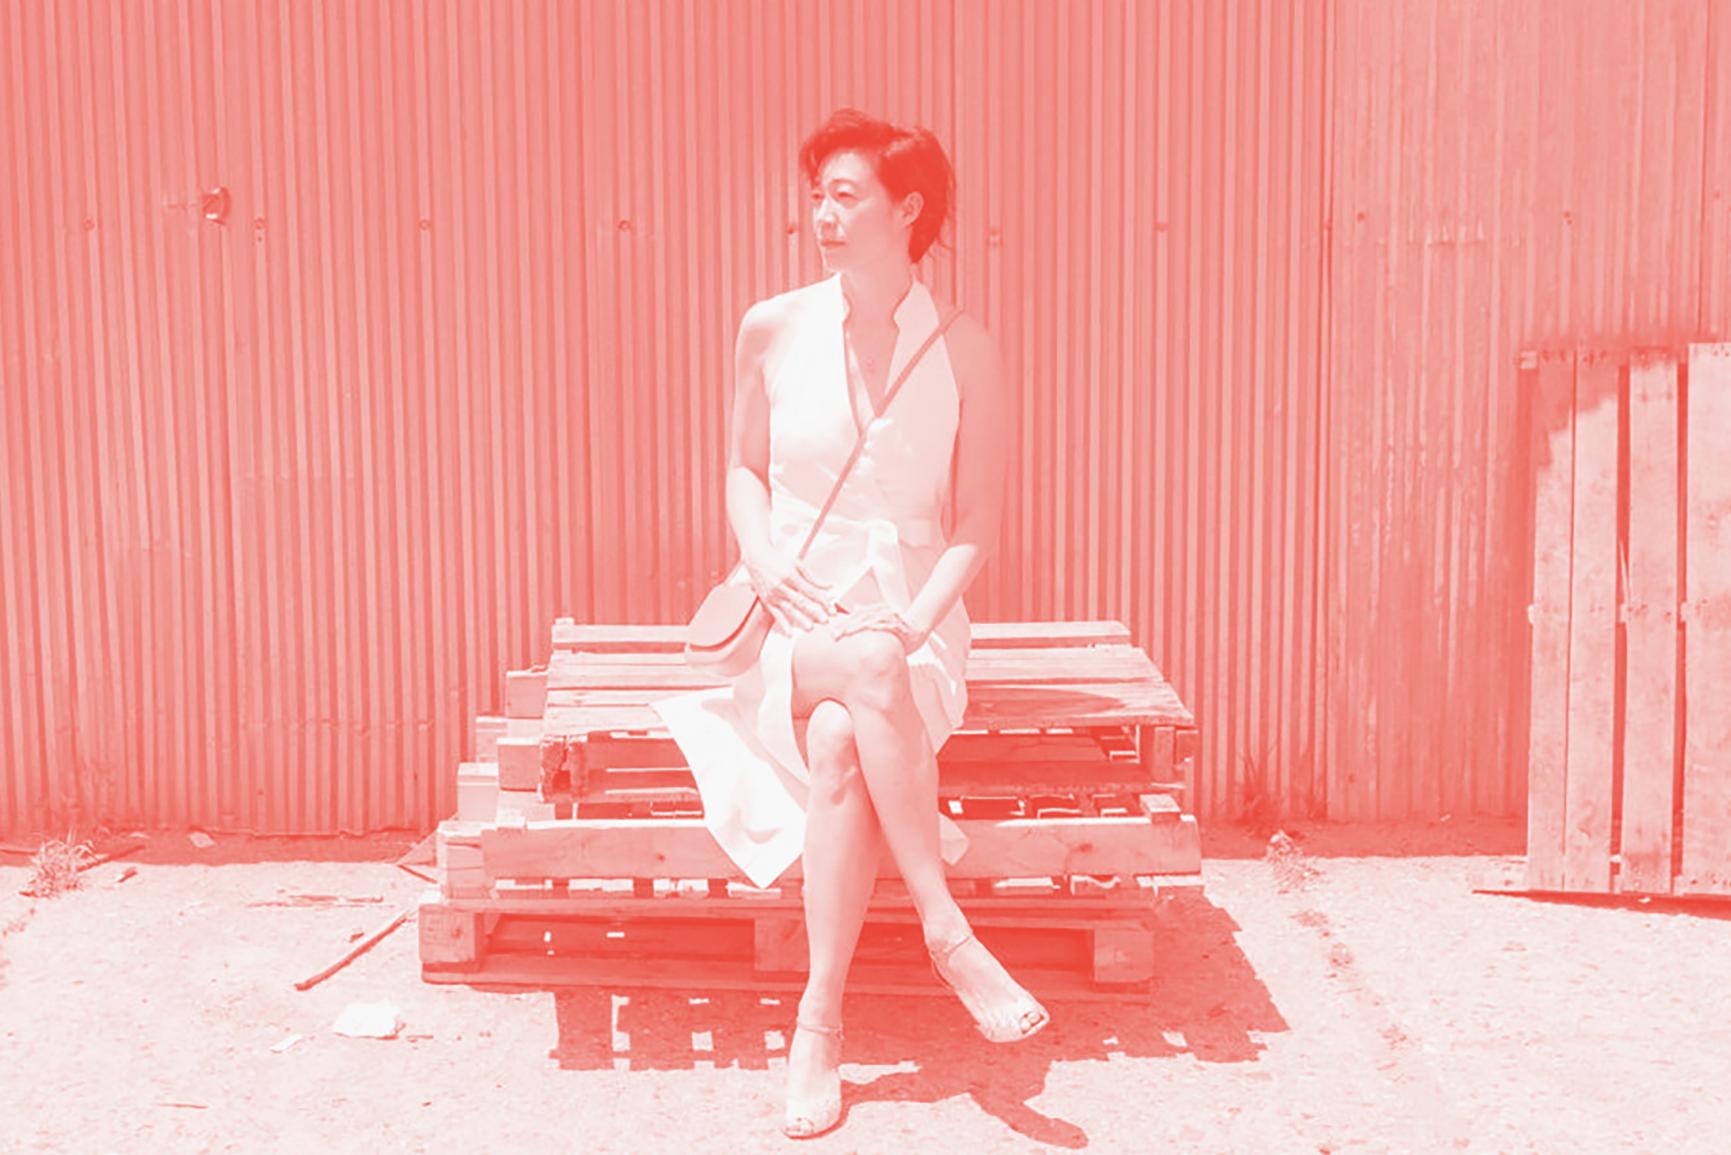 Karen-Wong-Newsfeed_3x2-crop.png